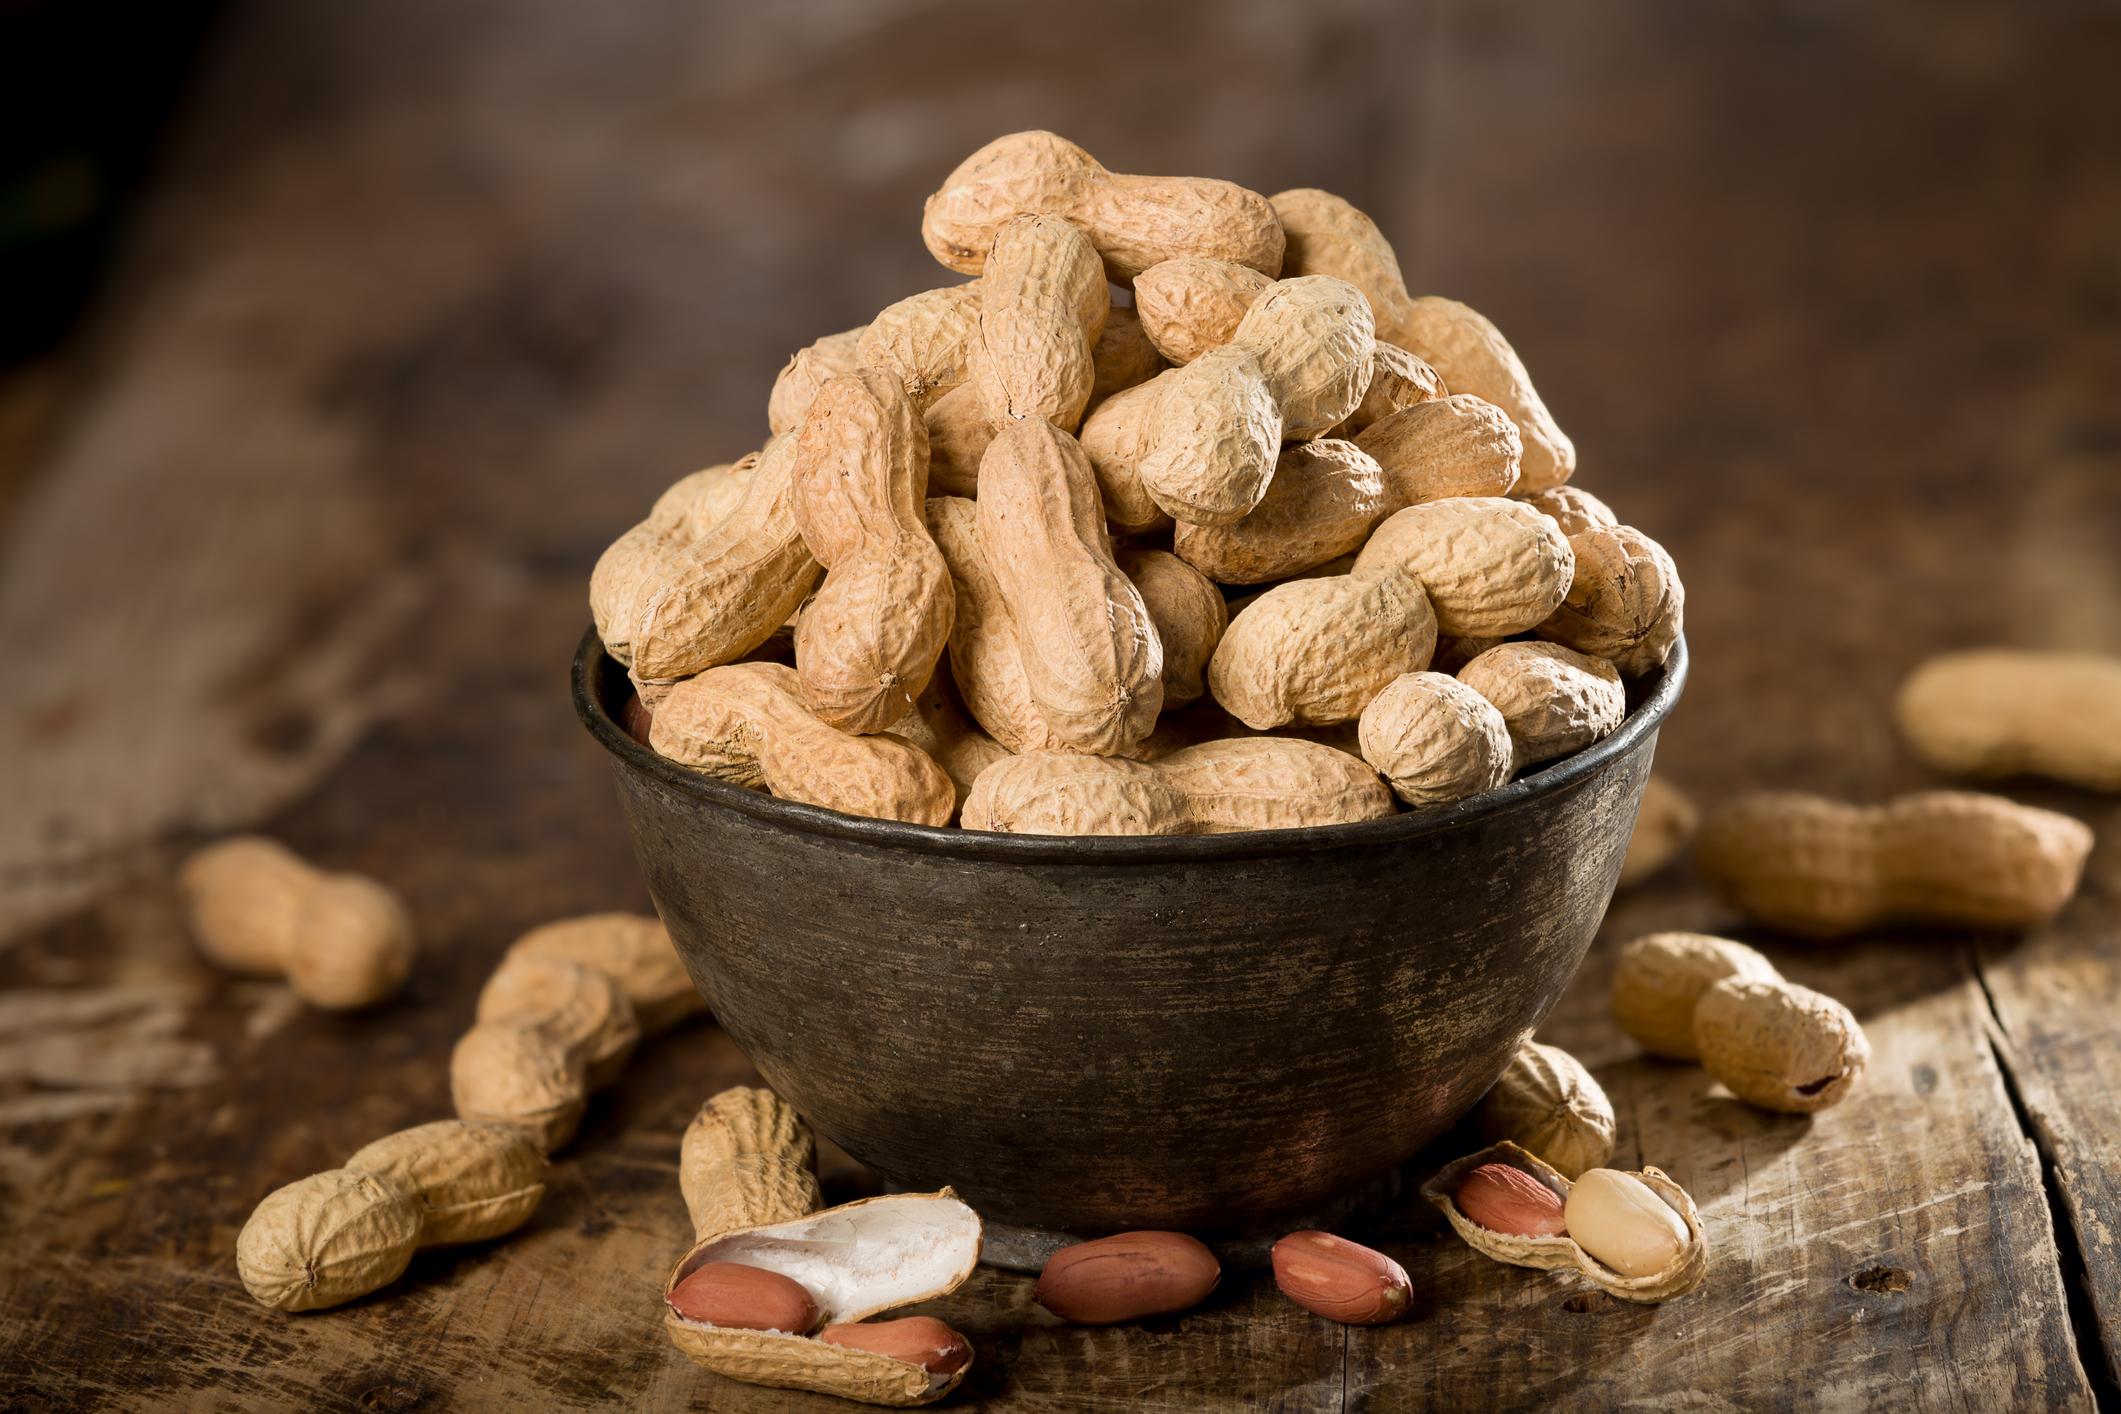 Aimmune Peanut Allergy Treatment